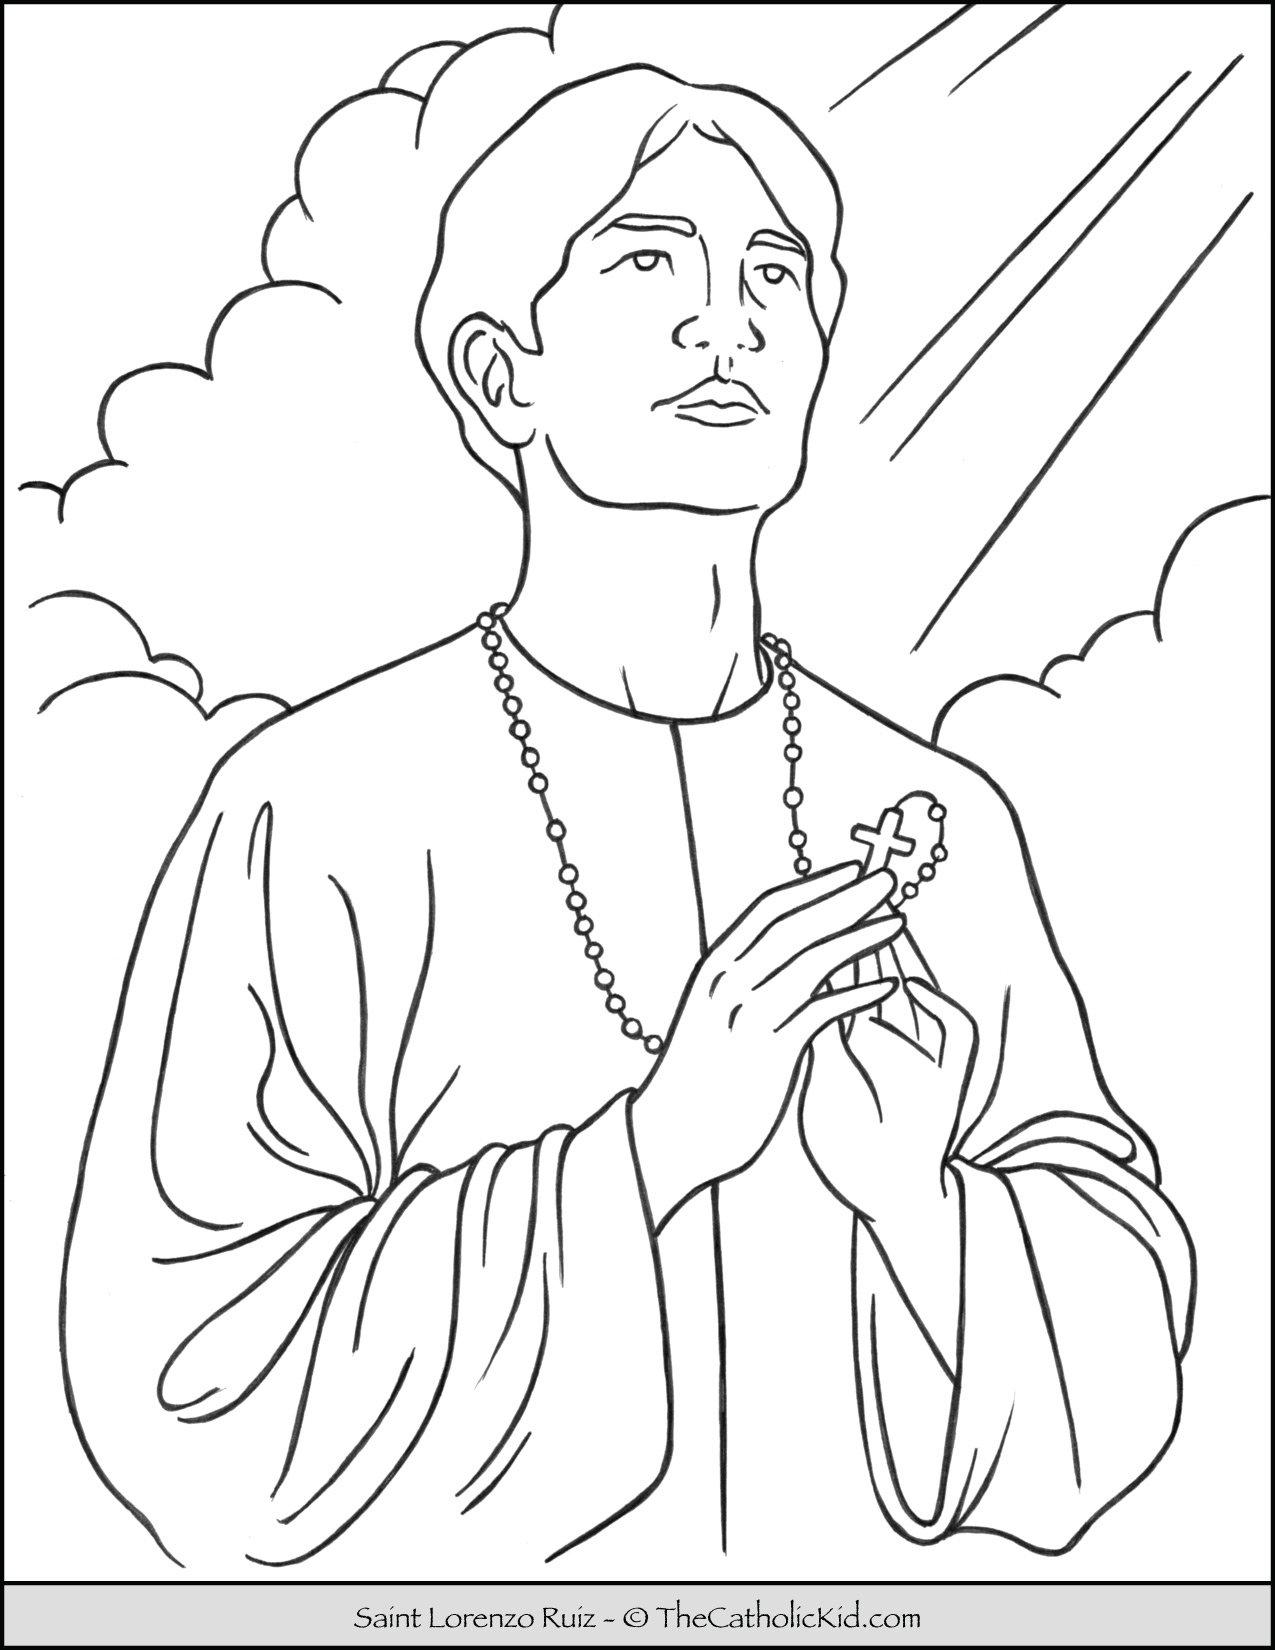 Saint Lorenzo Ruiz Coloring Page